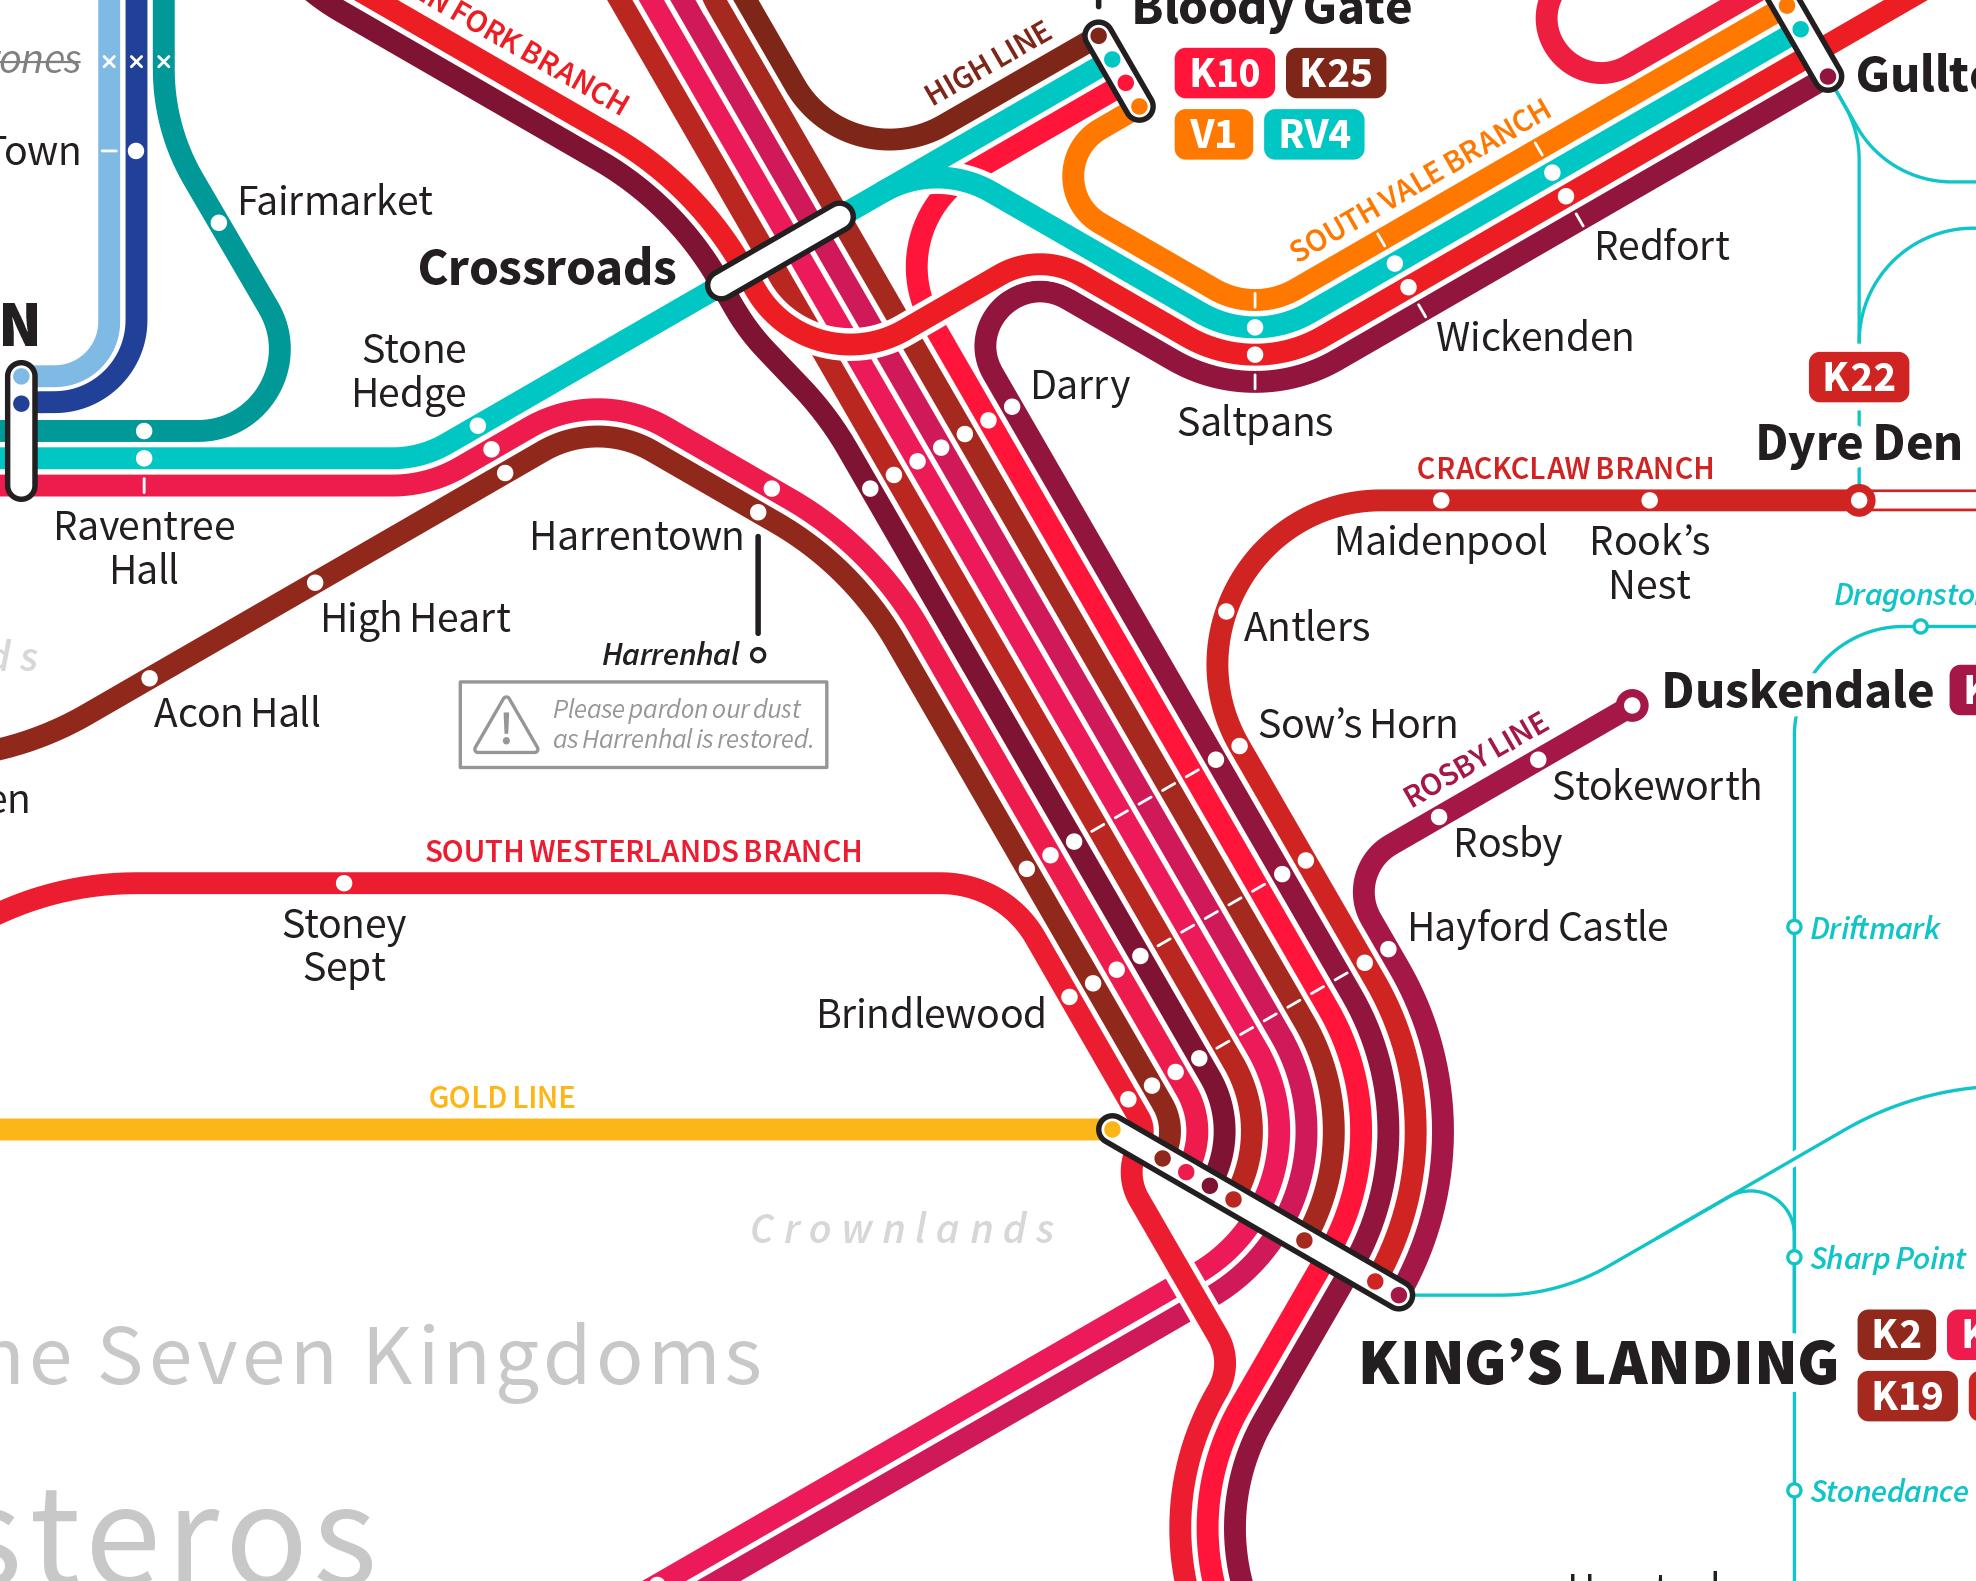 Game Of Thrones Transit Maps (4)